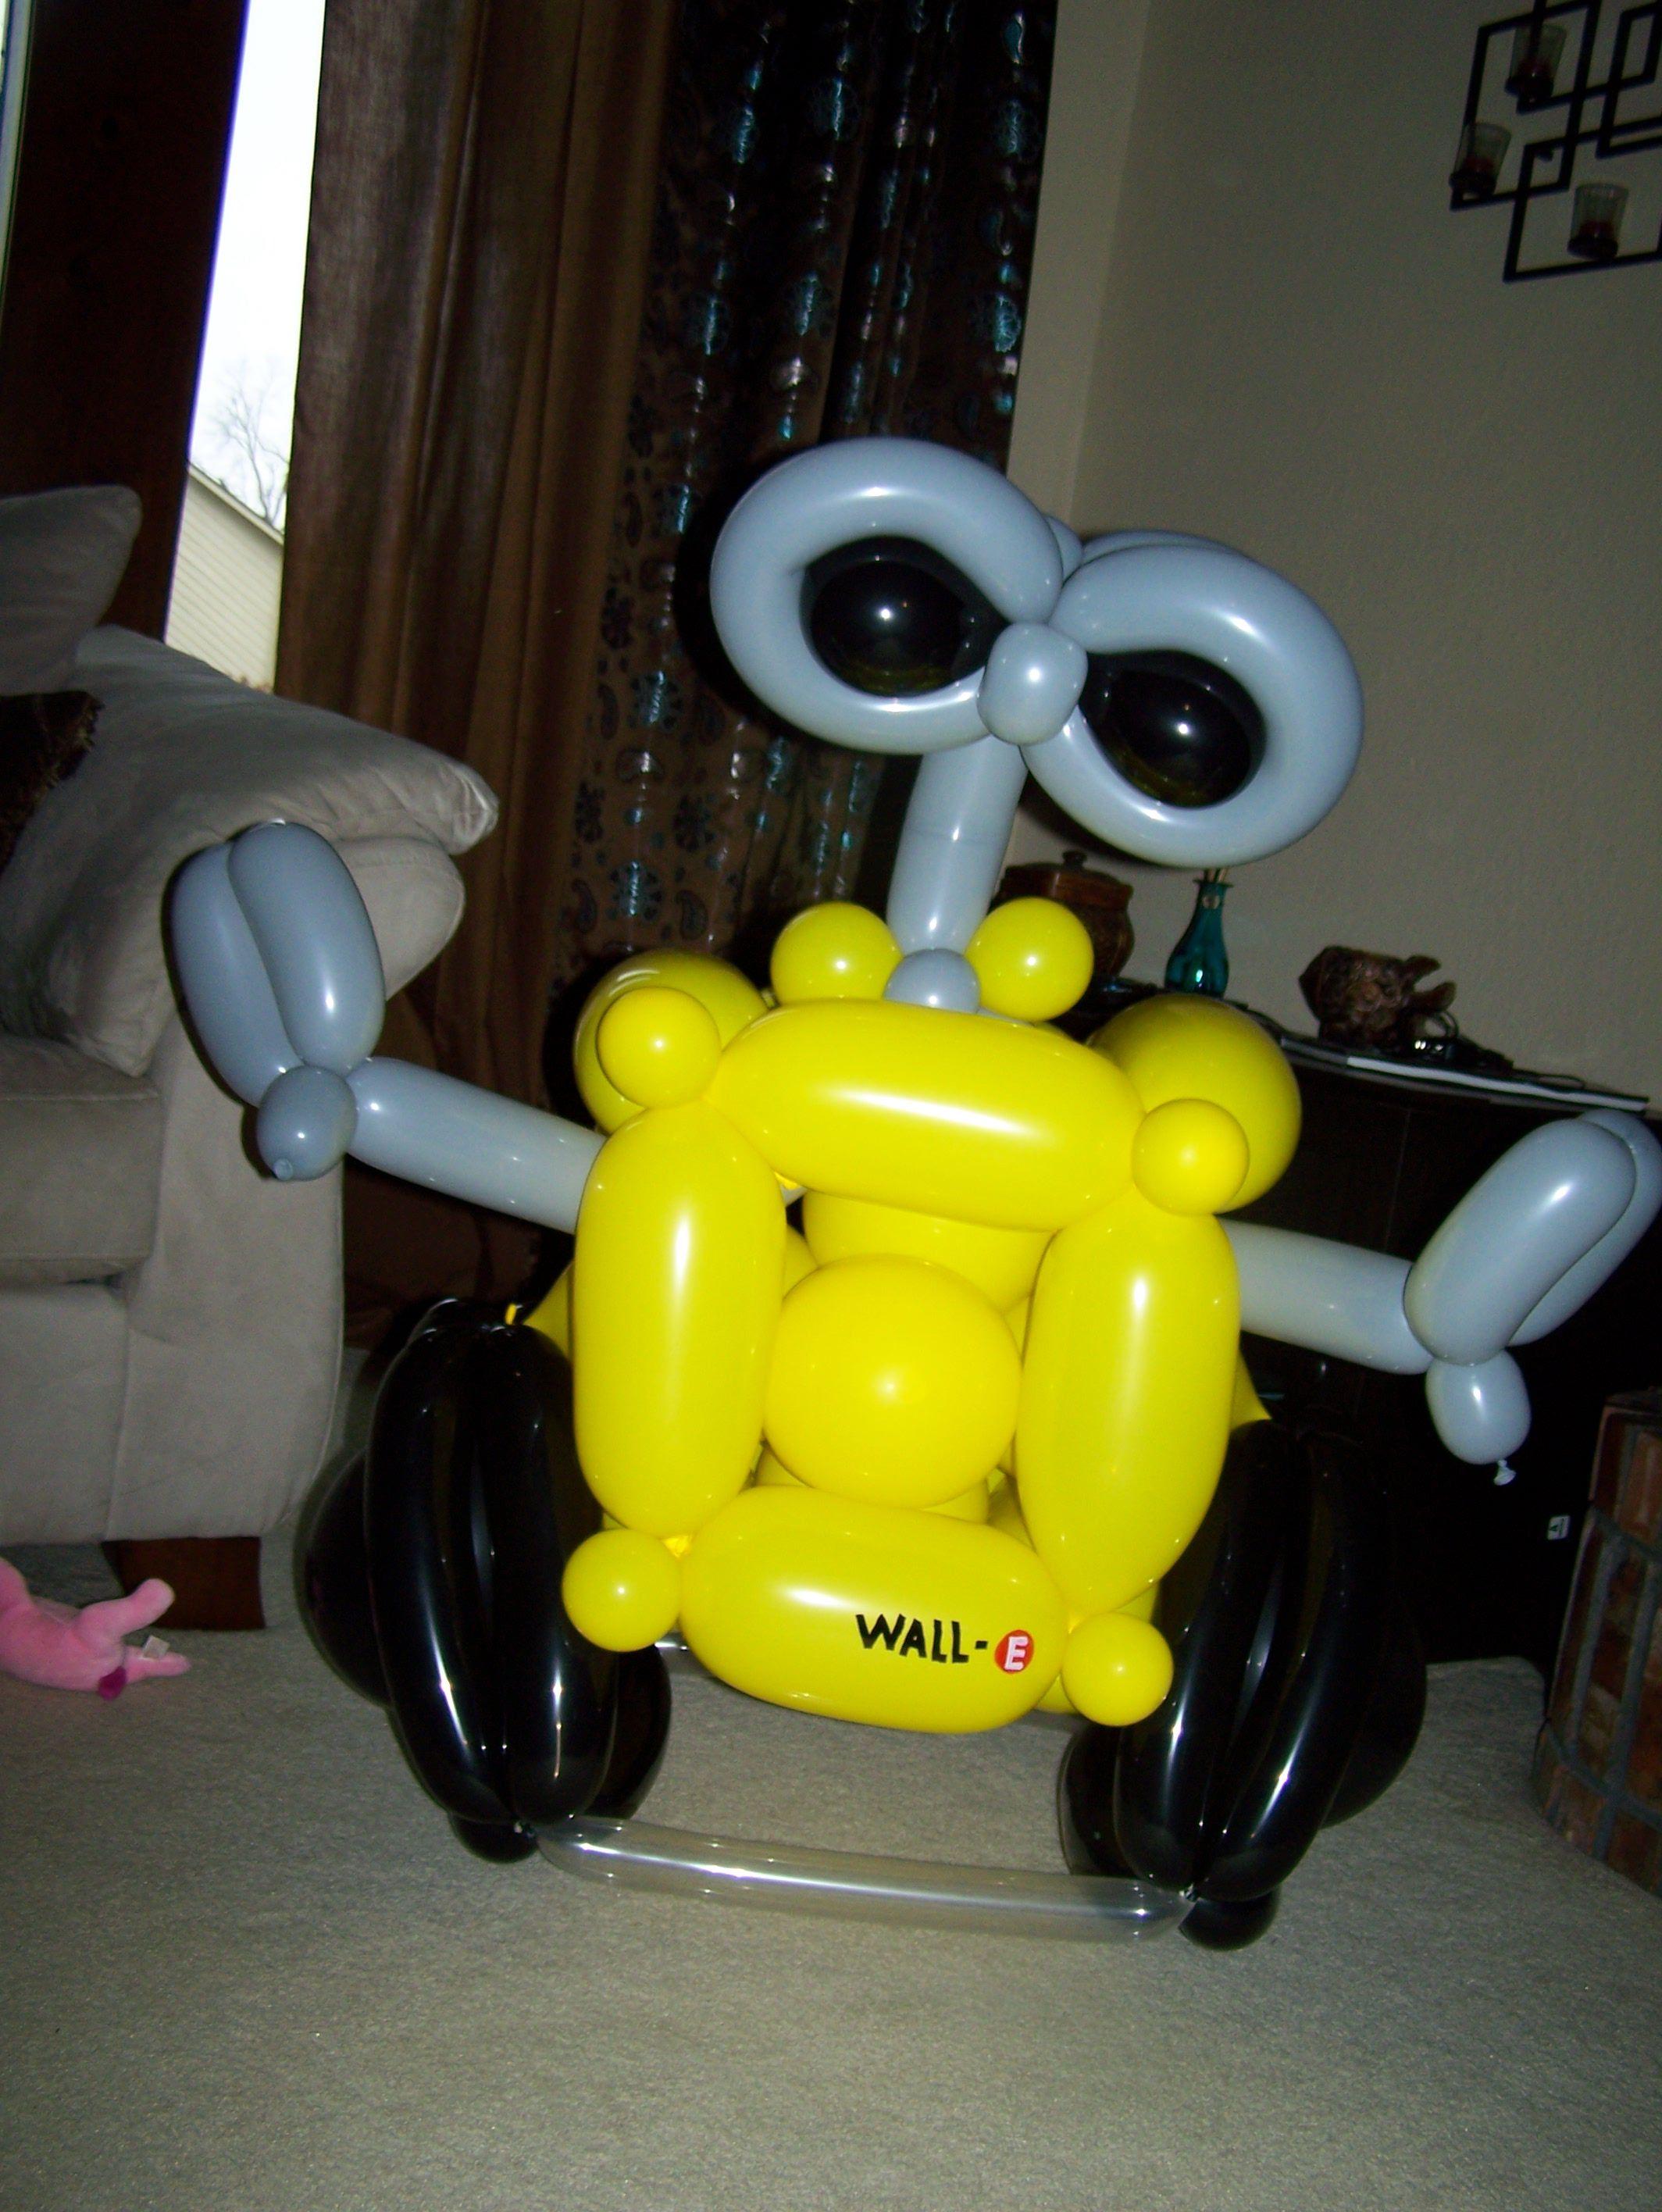 WALL-E ohmygosh | My next project | Pinterest | Robot, Carnival ...